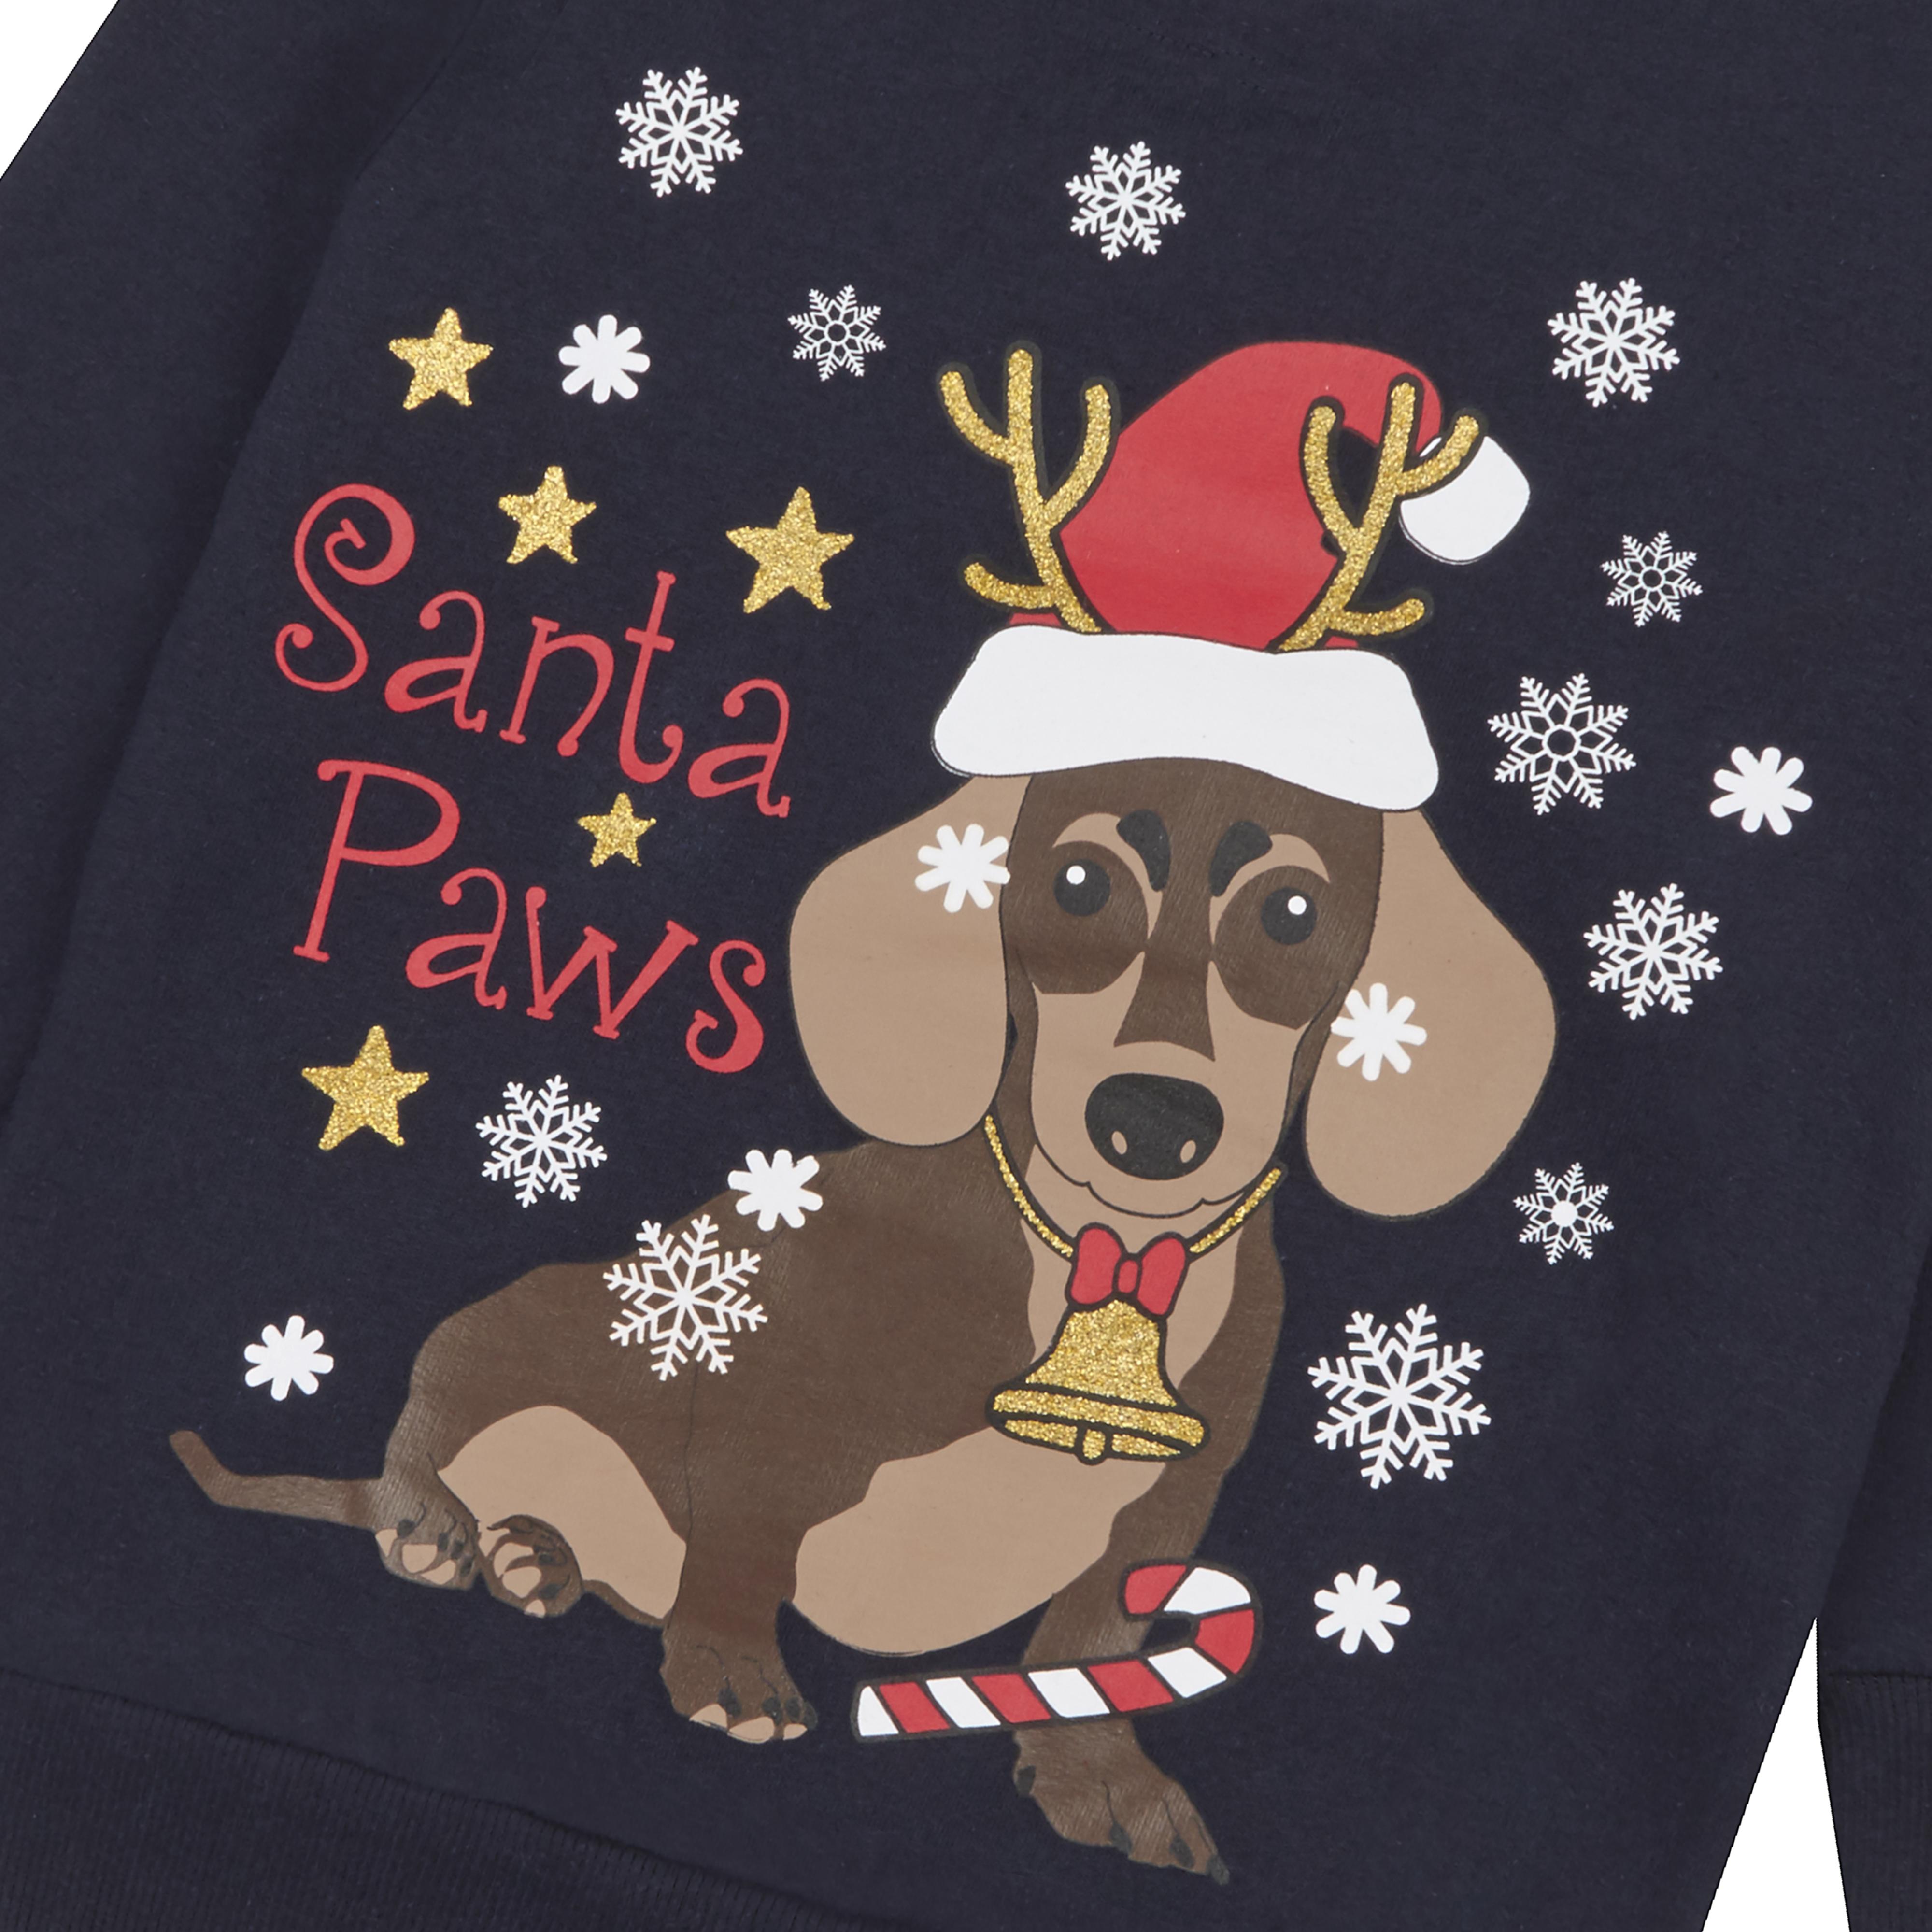 Childrens-Kids-Boys-Girls-Christmas-Xmas-Jumper-Sweatshirt-Rudolph-Glitter-Warm thumbnail 6